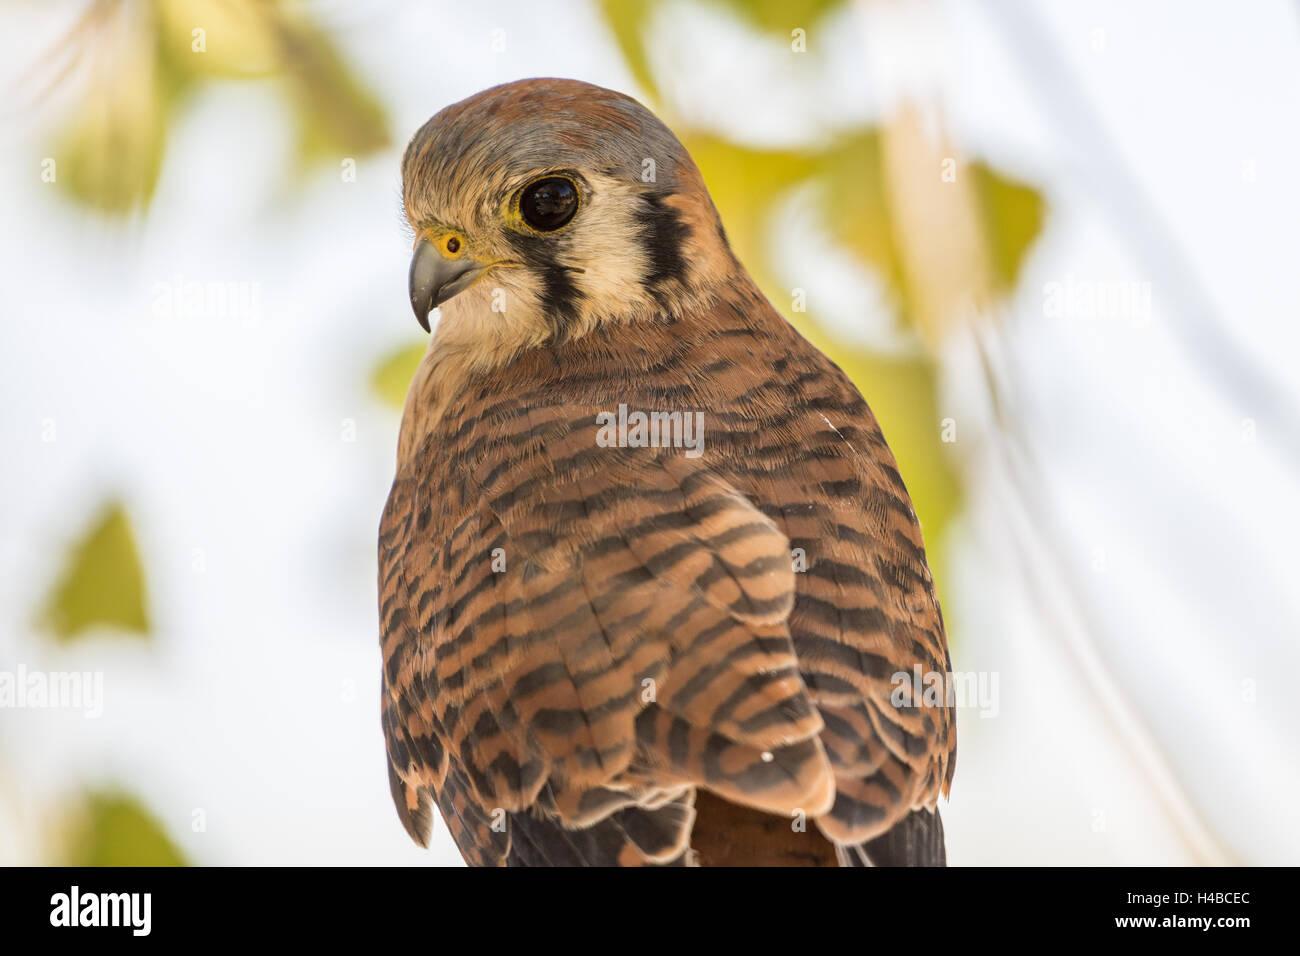 Female American Kestrel, (Falco sparvarius).  injured education animal with Wildlife Rescue Inc., New Mexico. - Stock Image